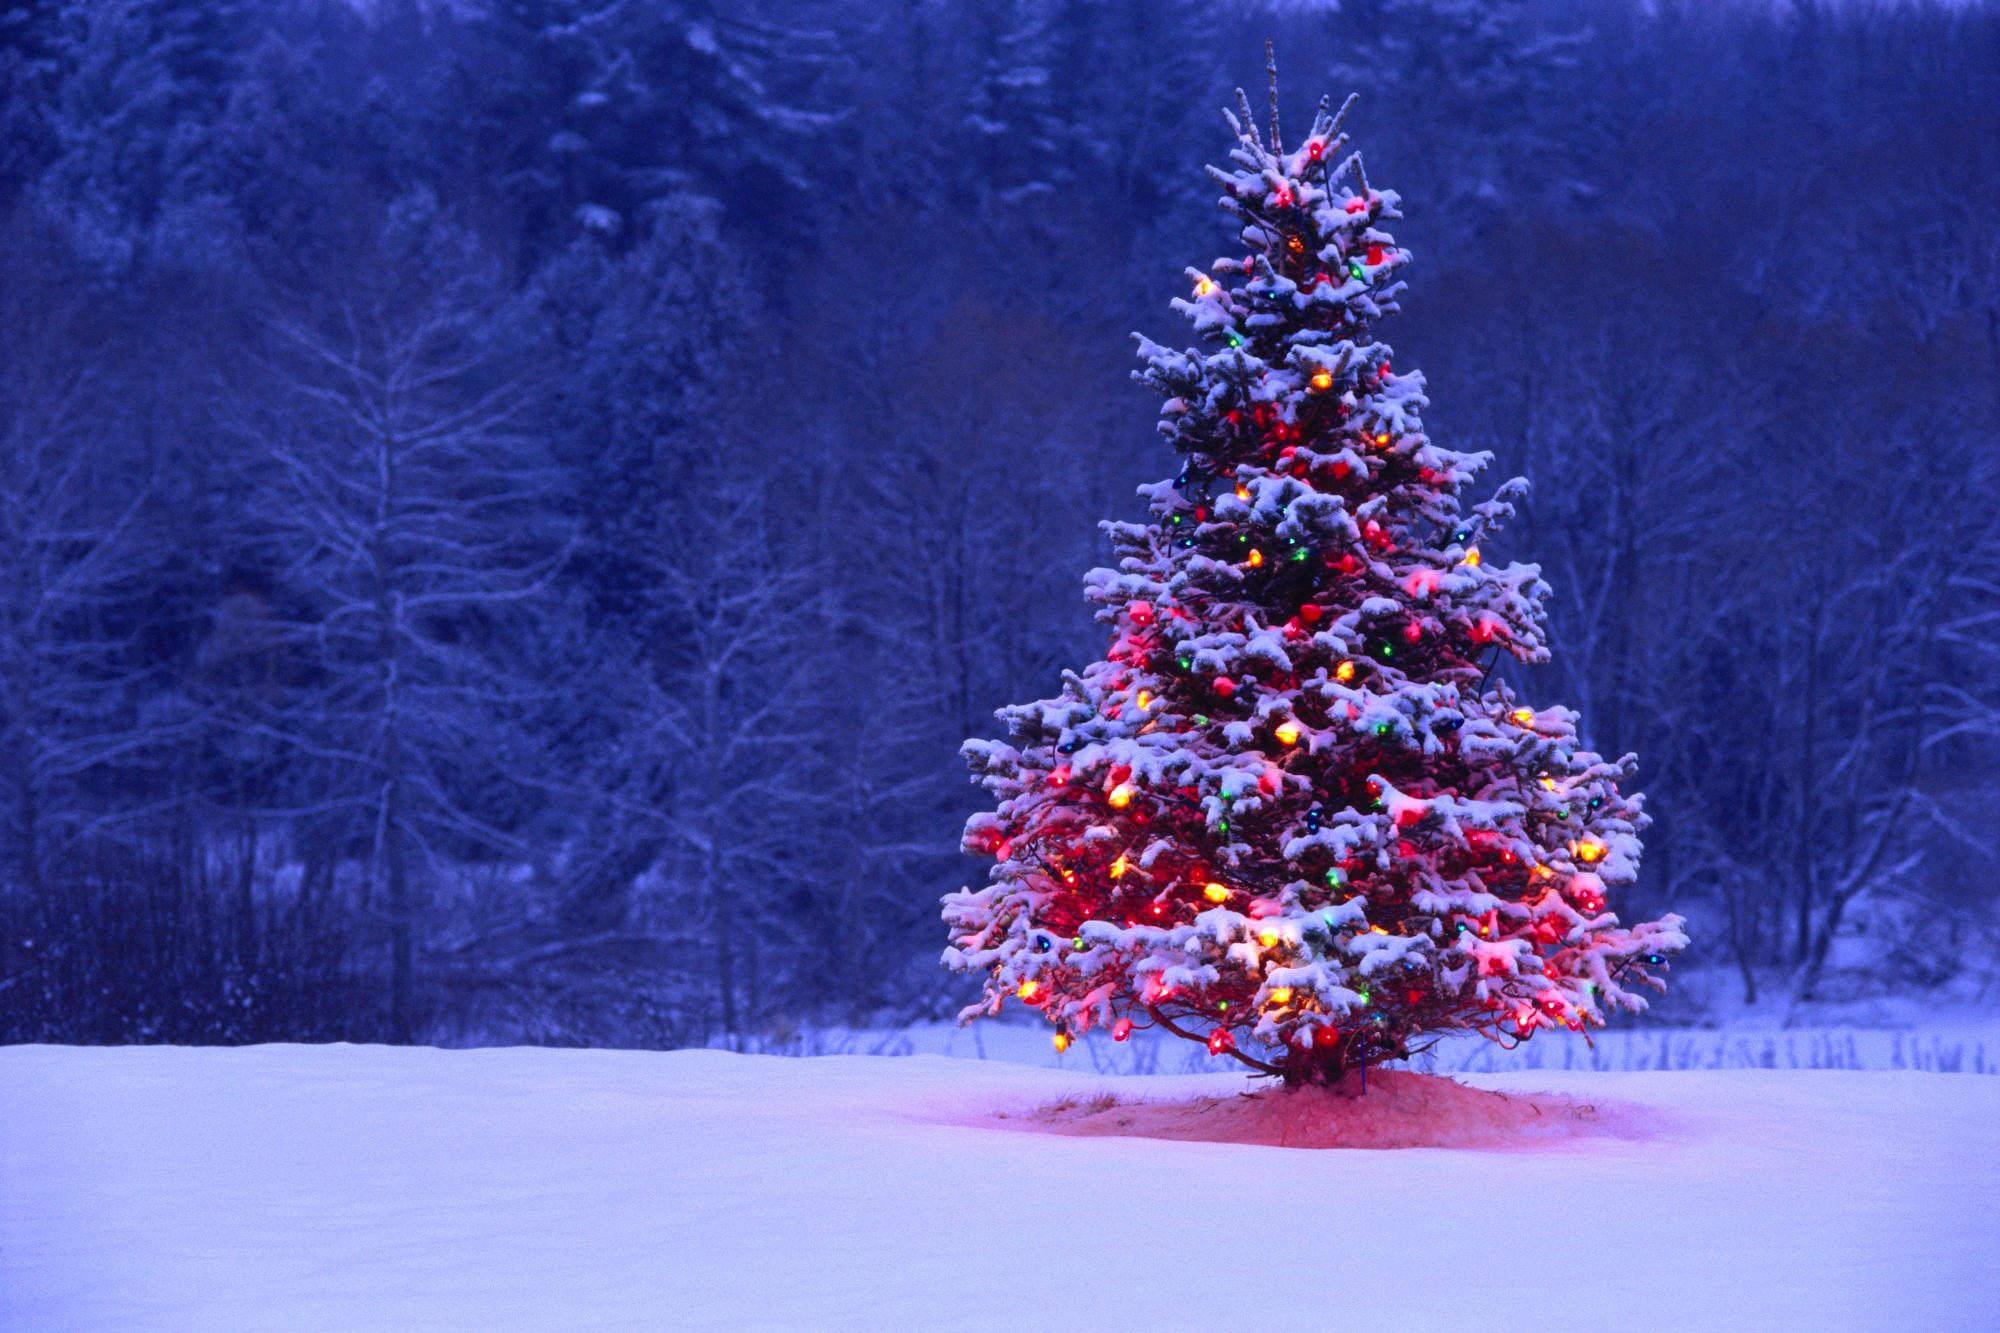 3d обои нарядная елка в лесу зима 41015